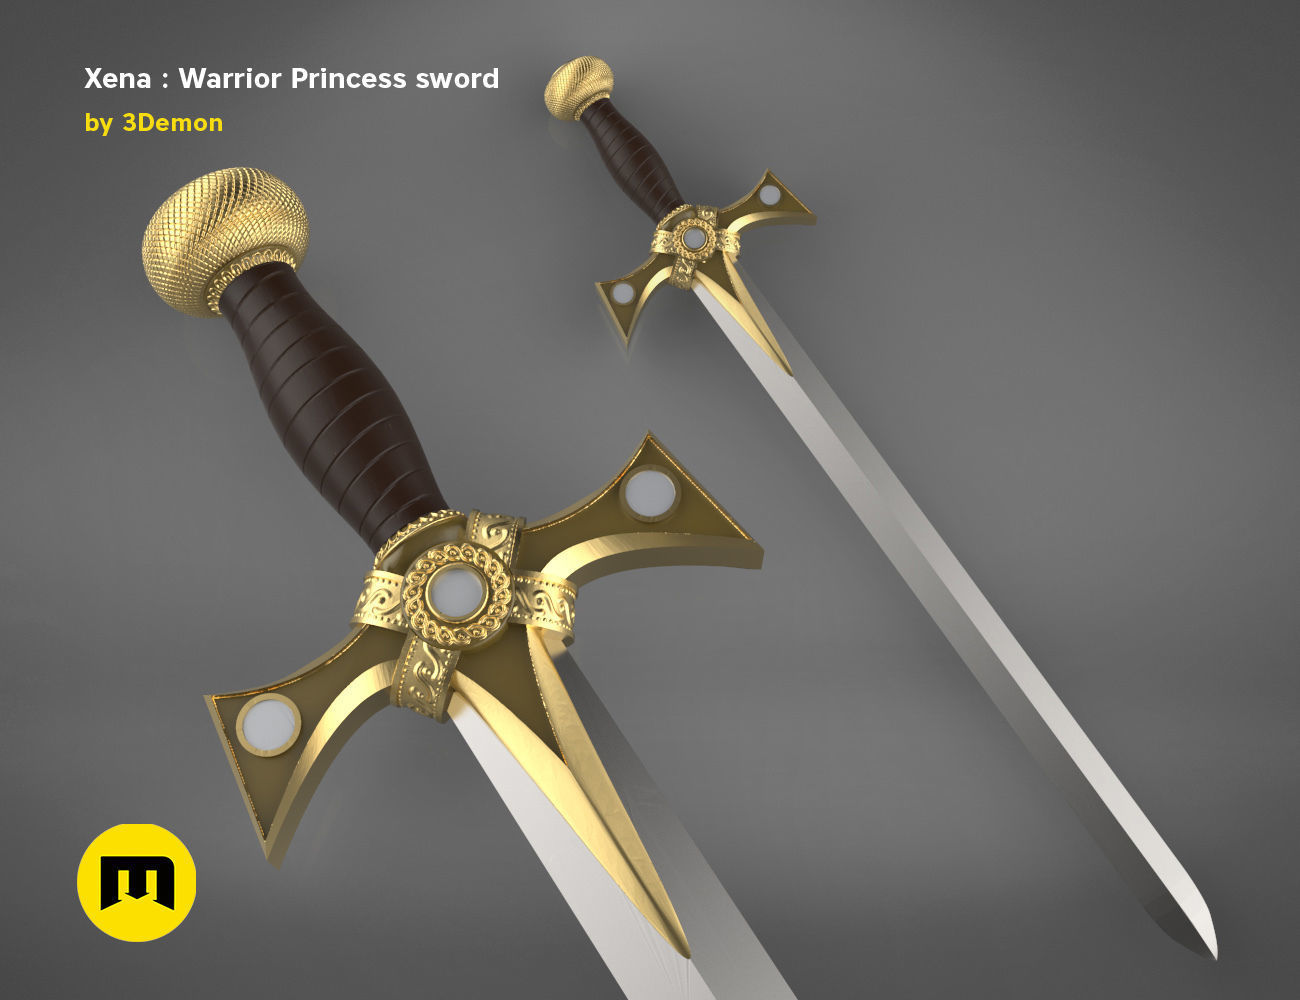 Xena - Warrior Princess Sword